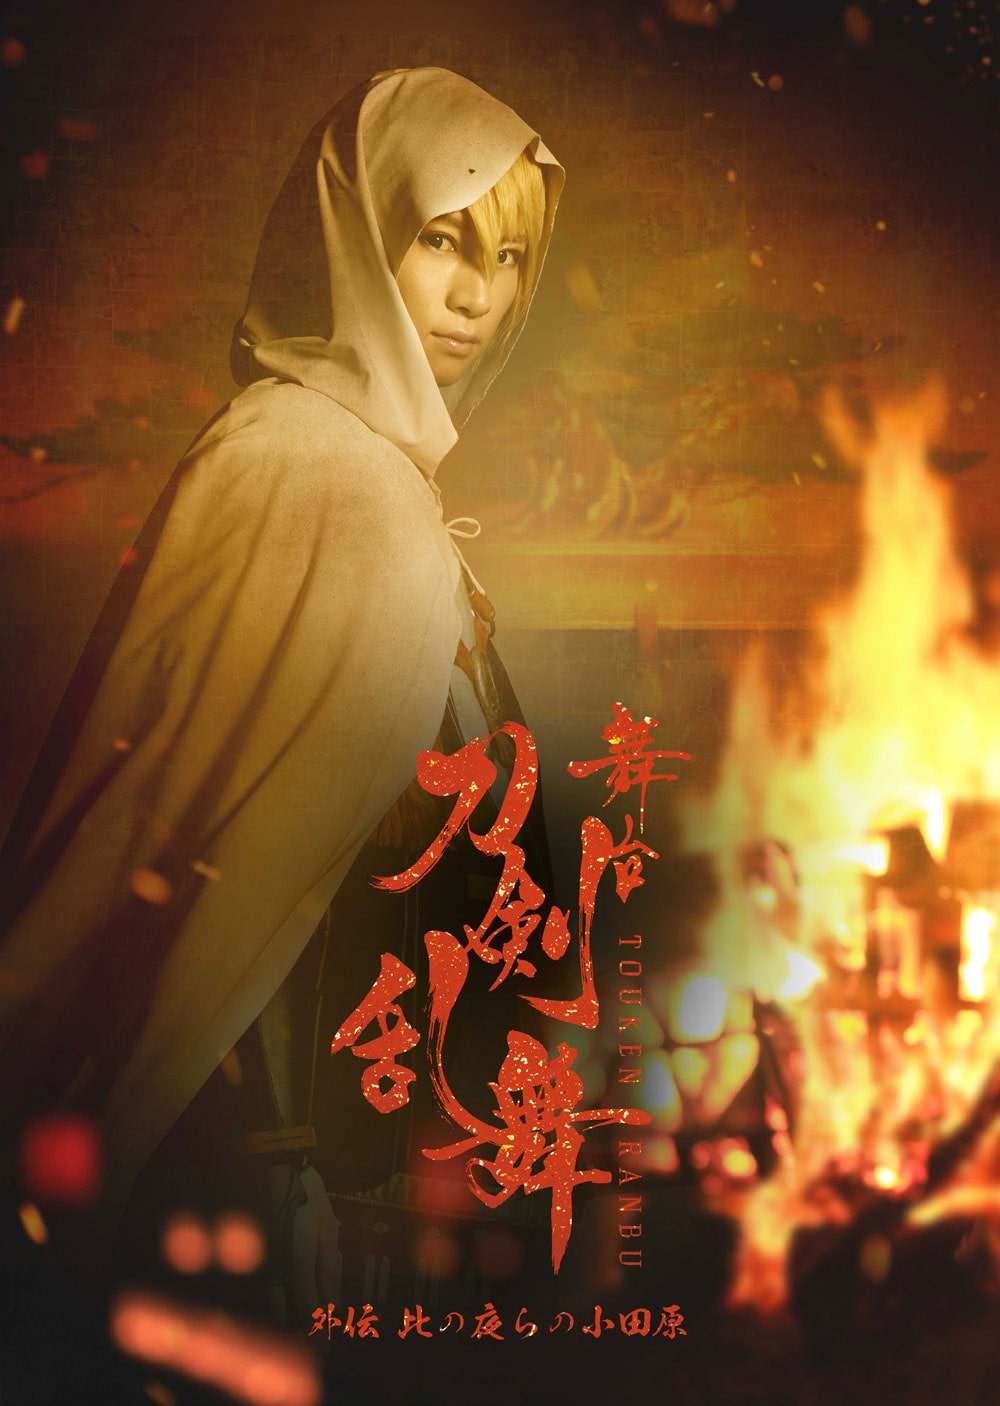 舞台『刀剣乱舞』外伝 此の夜らの小田原 Blu-ray 初回生産限定版